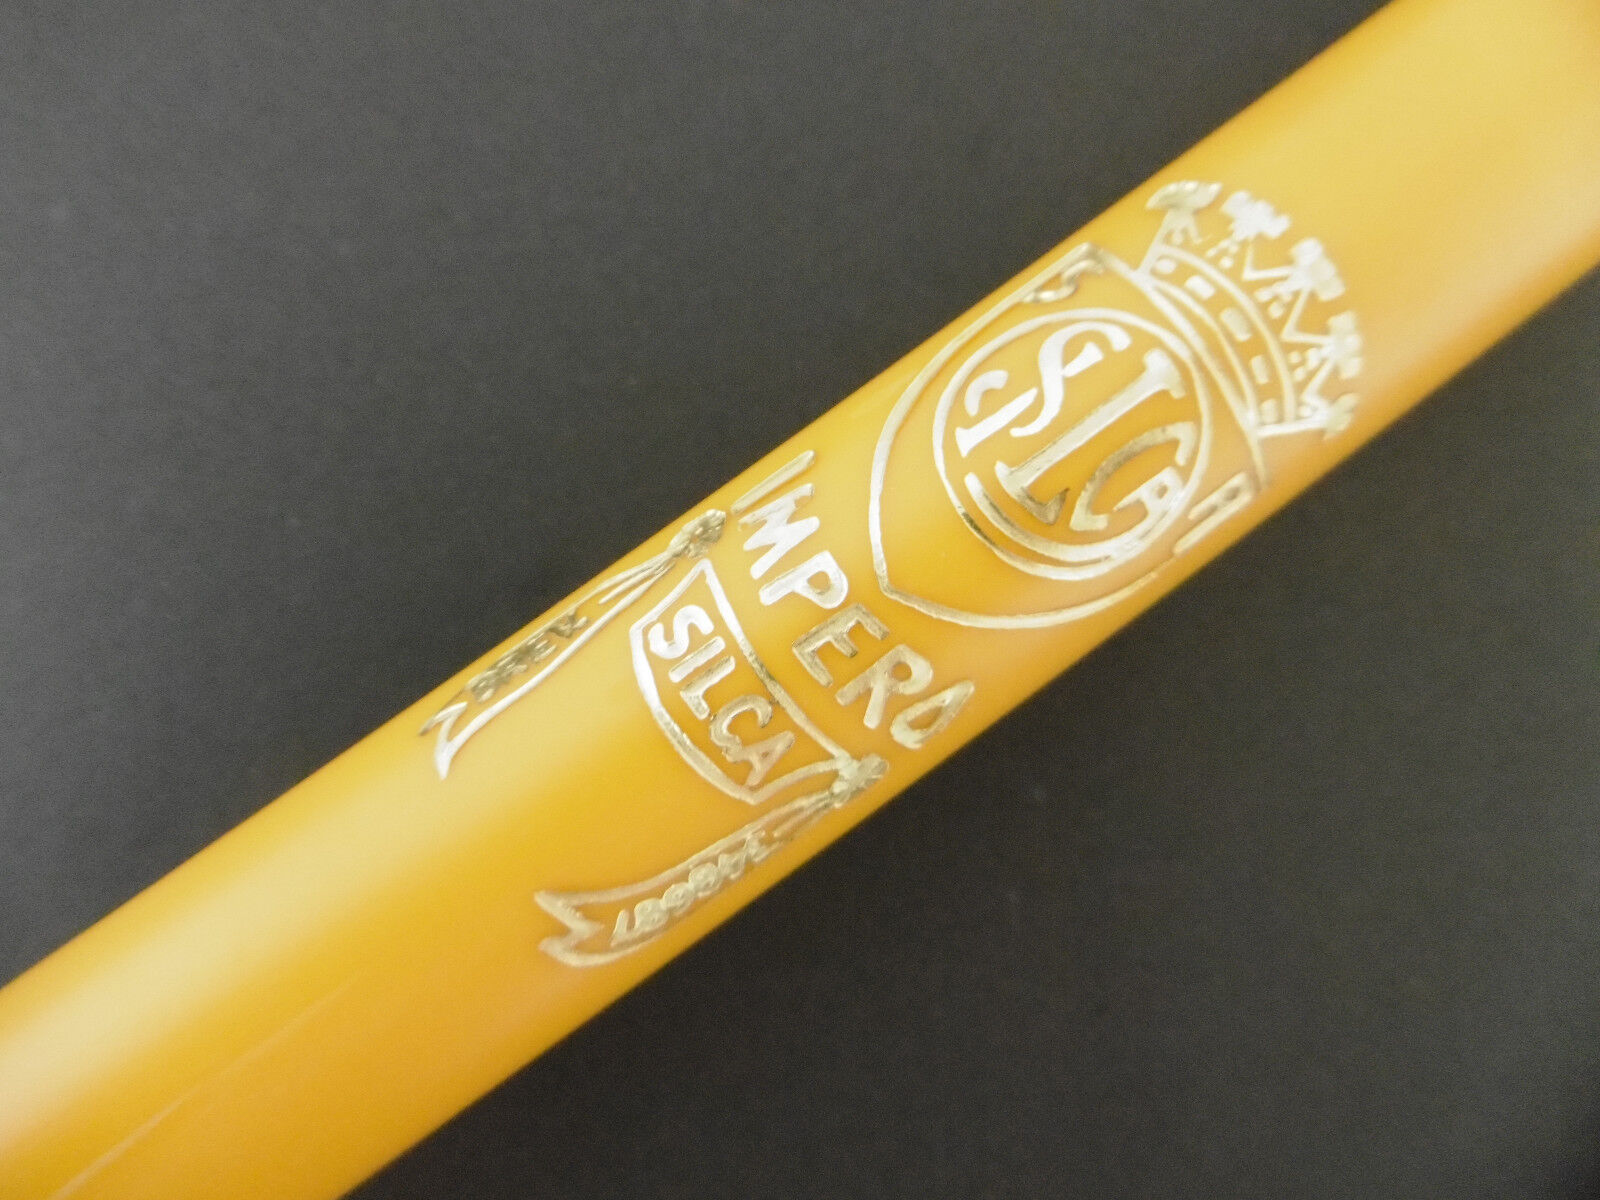 New pump Silca Impero Brevettato road bicycle  bike yellow  presta dunlop 590mm  enjoy saving 30-50% off